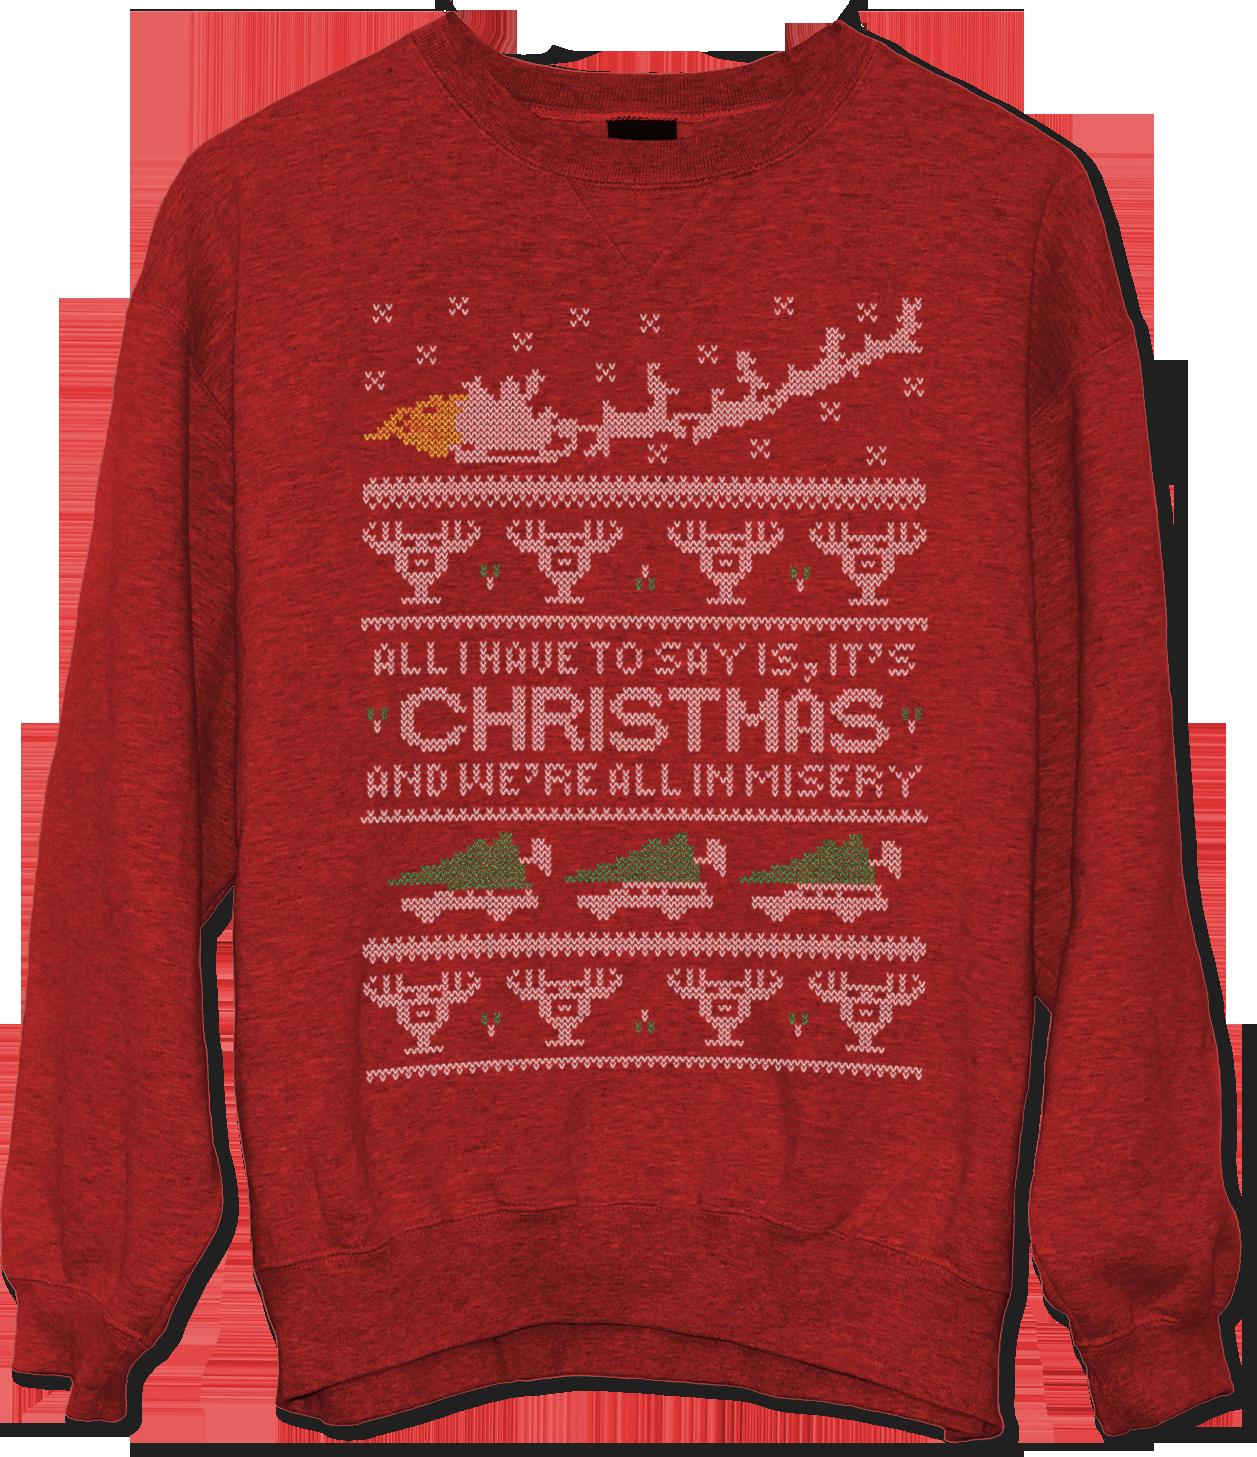 National Lampoon's Christmas Vacation Misery Ugly Christmas Sweater Jlane Design Teepublic